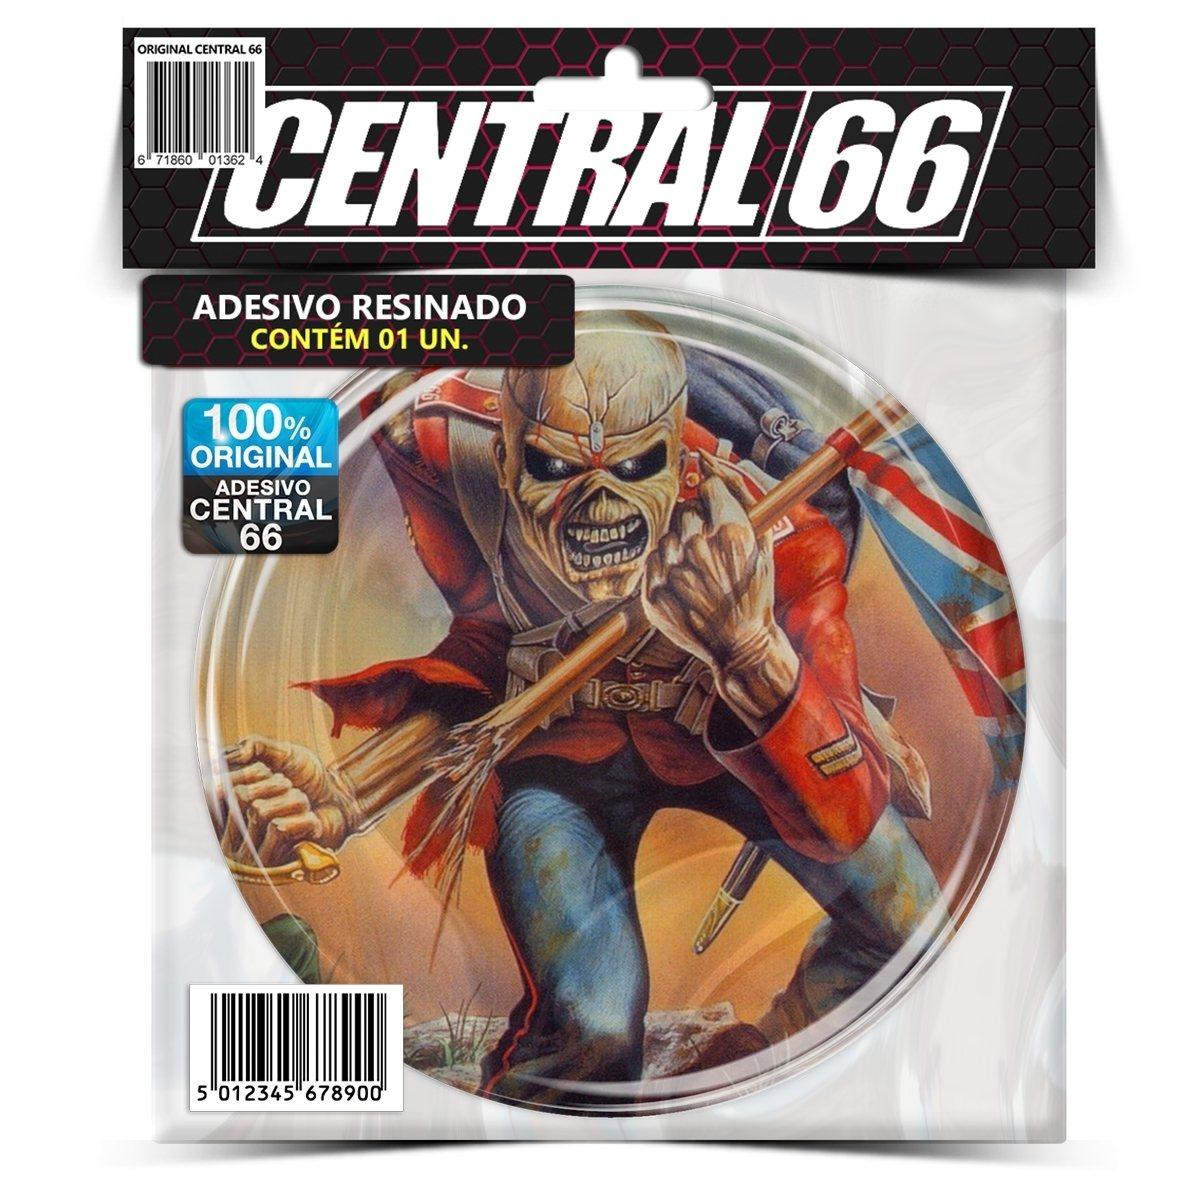 Adesivo Redondo Iron Maiden The Trooper – Central 66